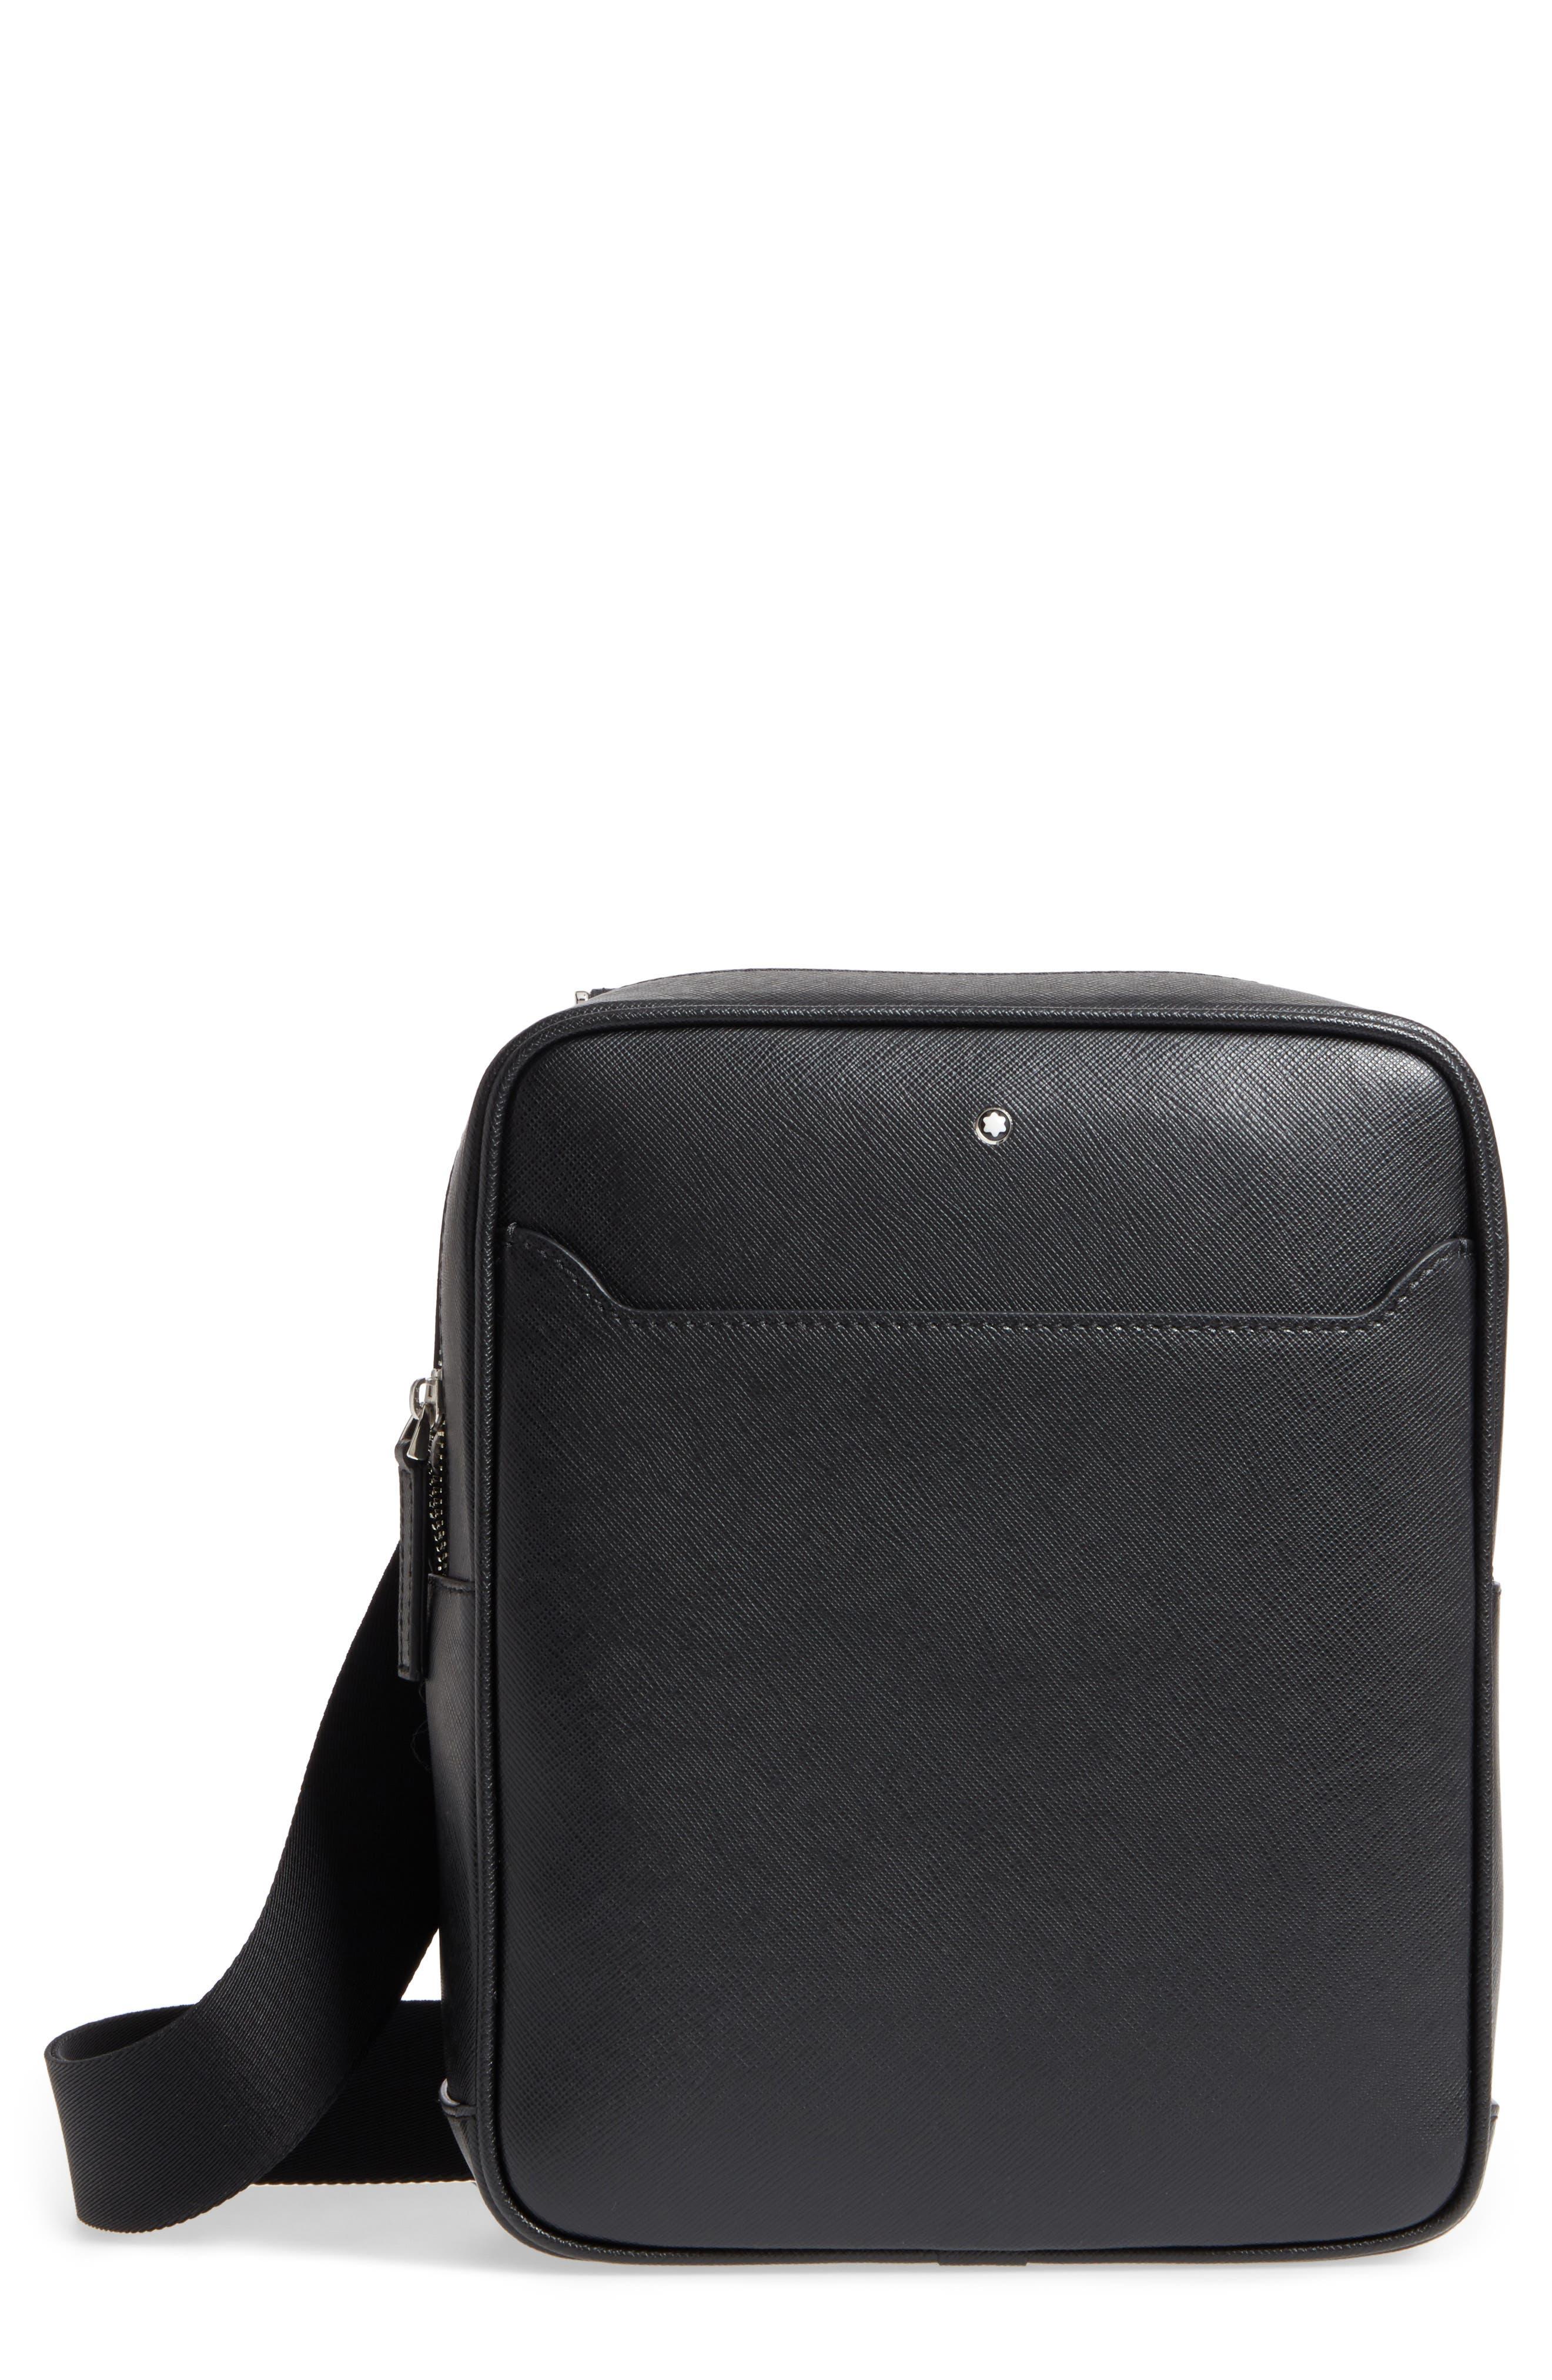 Sartorial North South Leather Bag,                             Main thumbnail 1, color,                             001